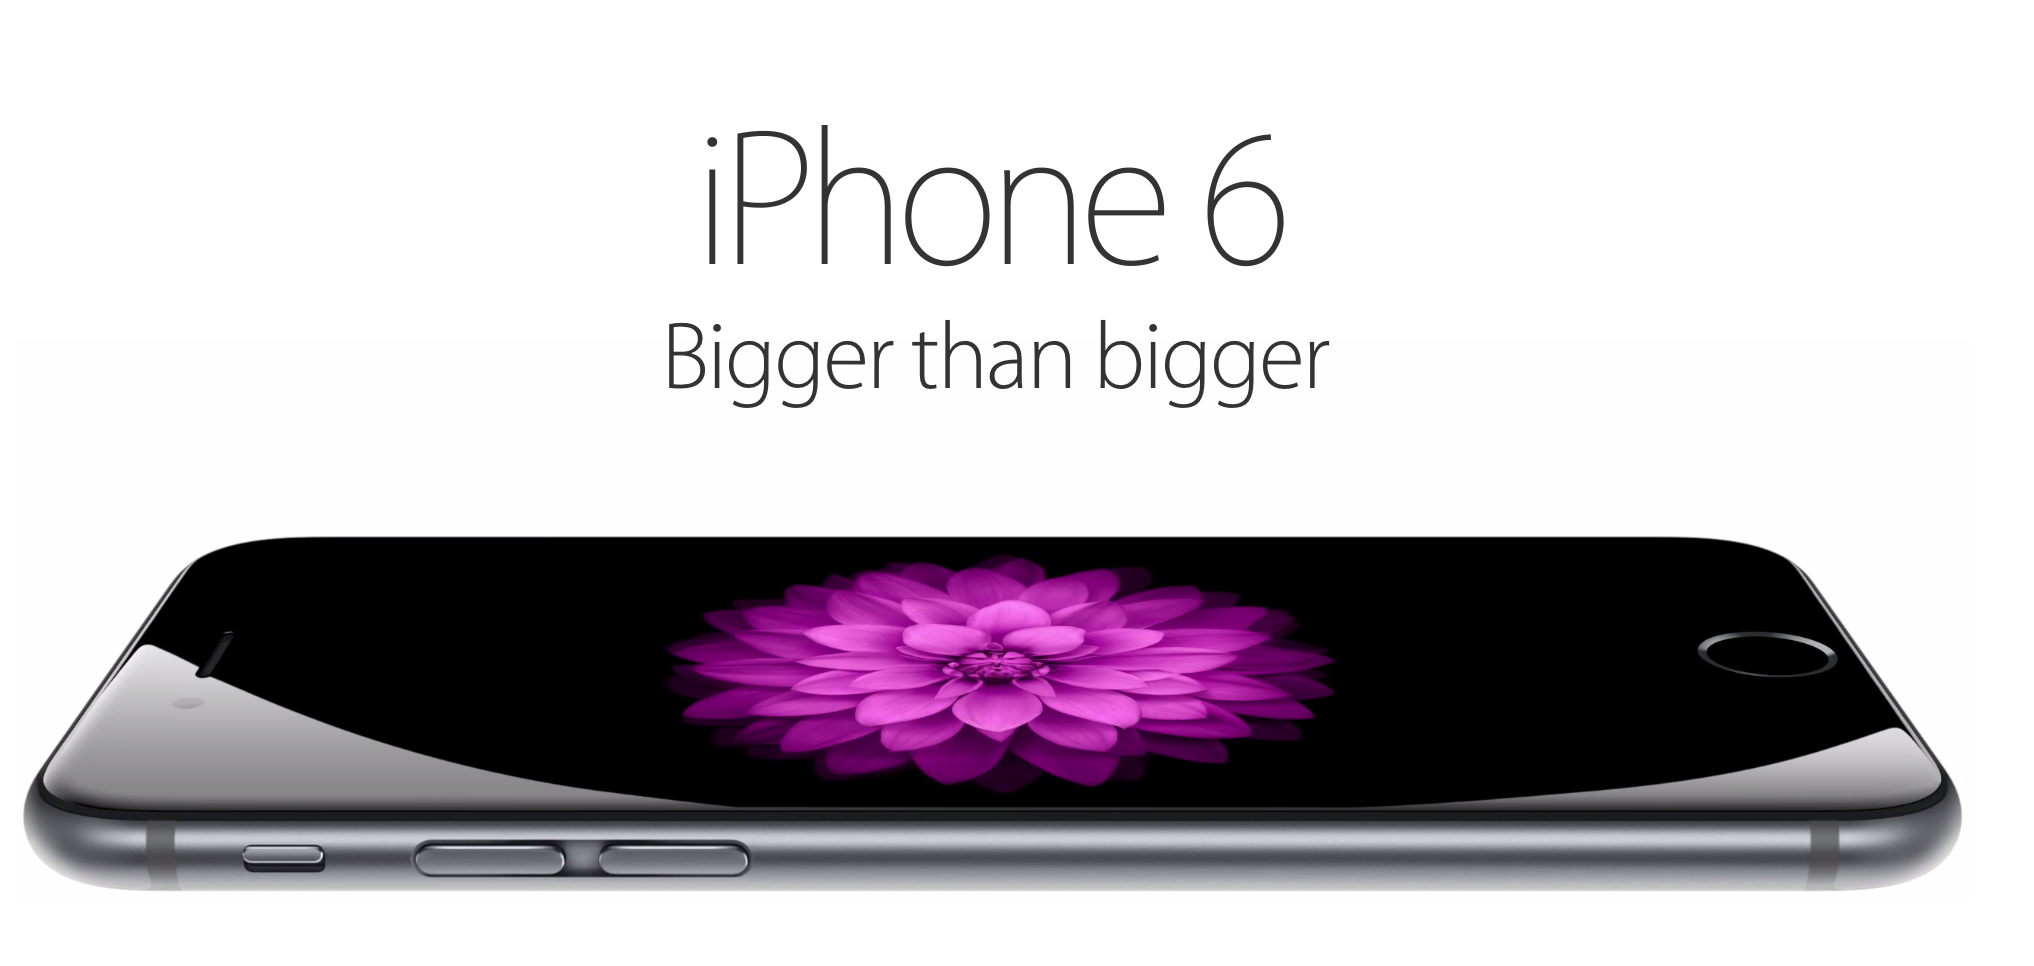 iPhone 6 - Bigger Better